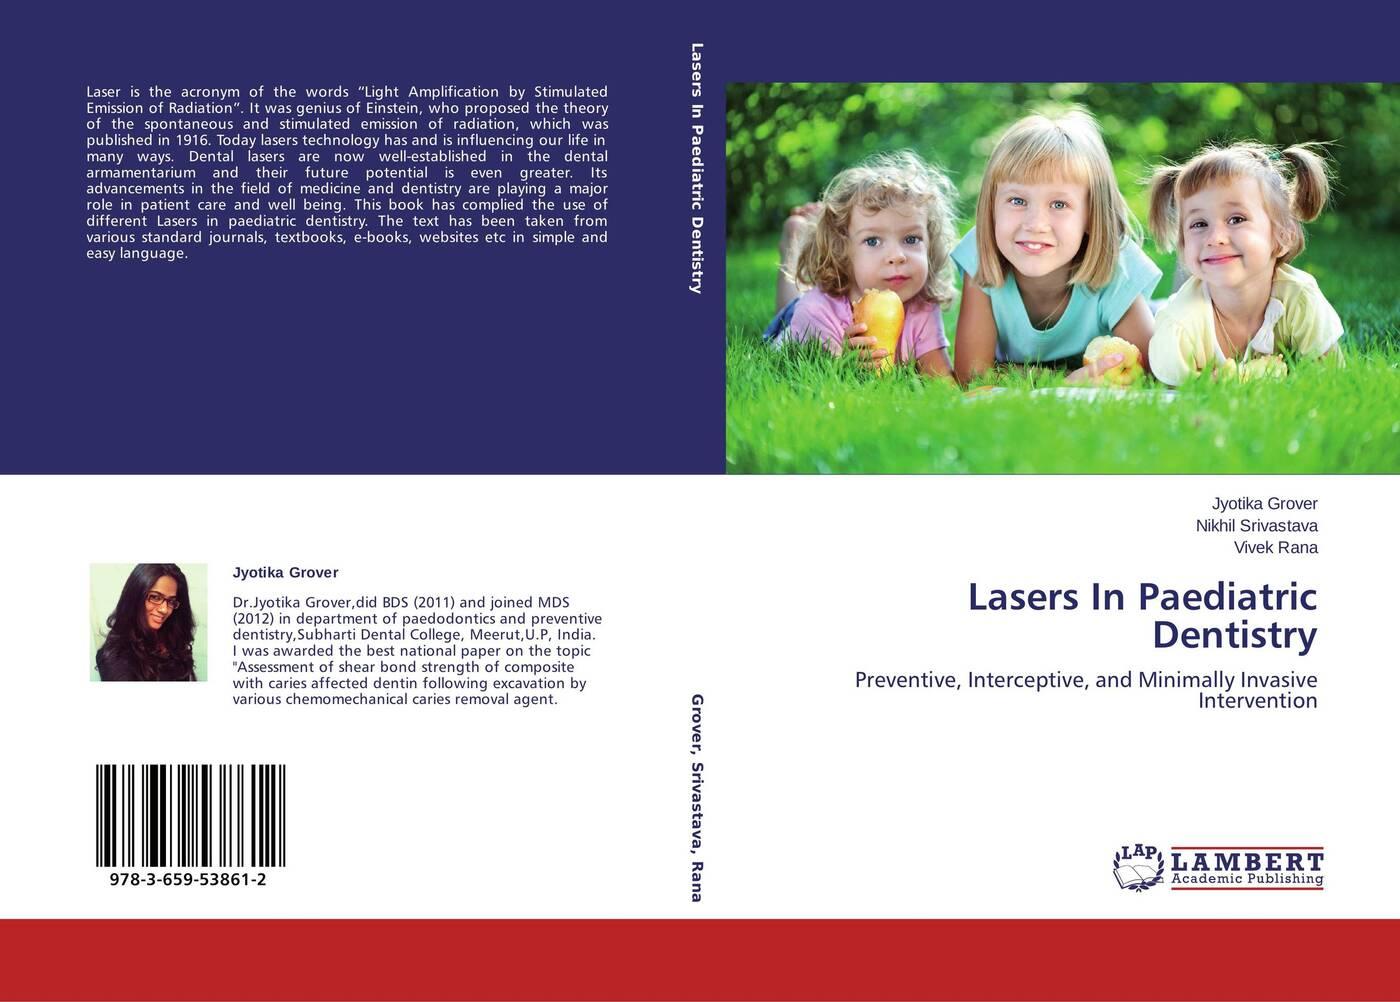 Jyotika Grover,Nikhil Srivastava and Vivek Rana Lasers In Paediatric Dentistry недорого